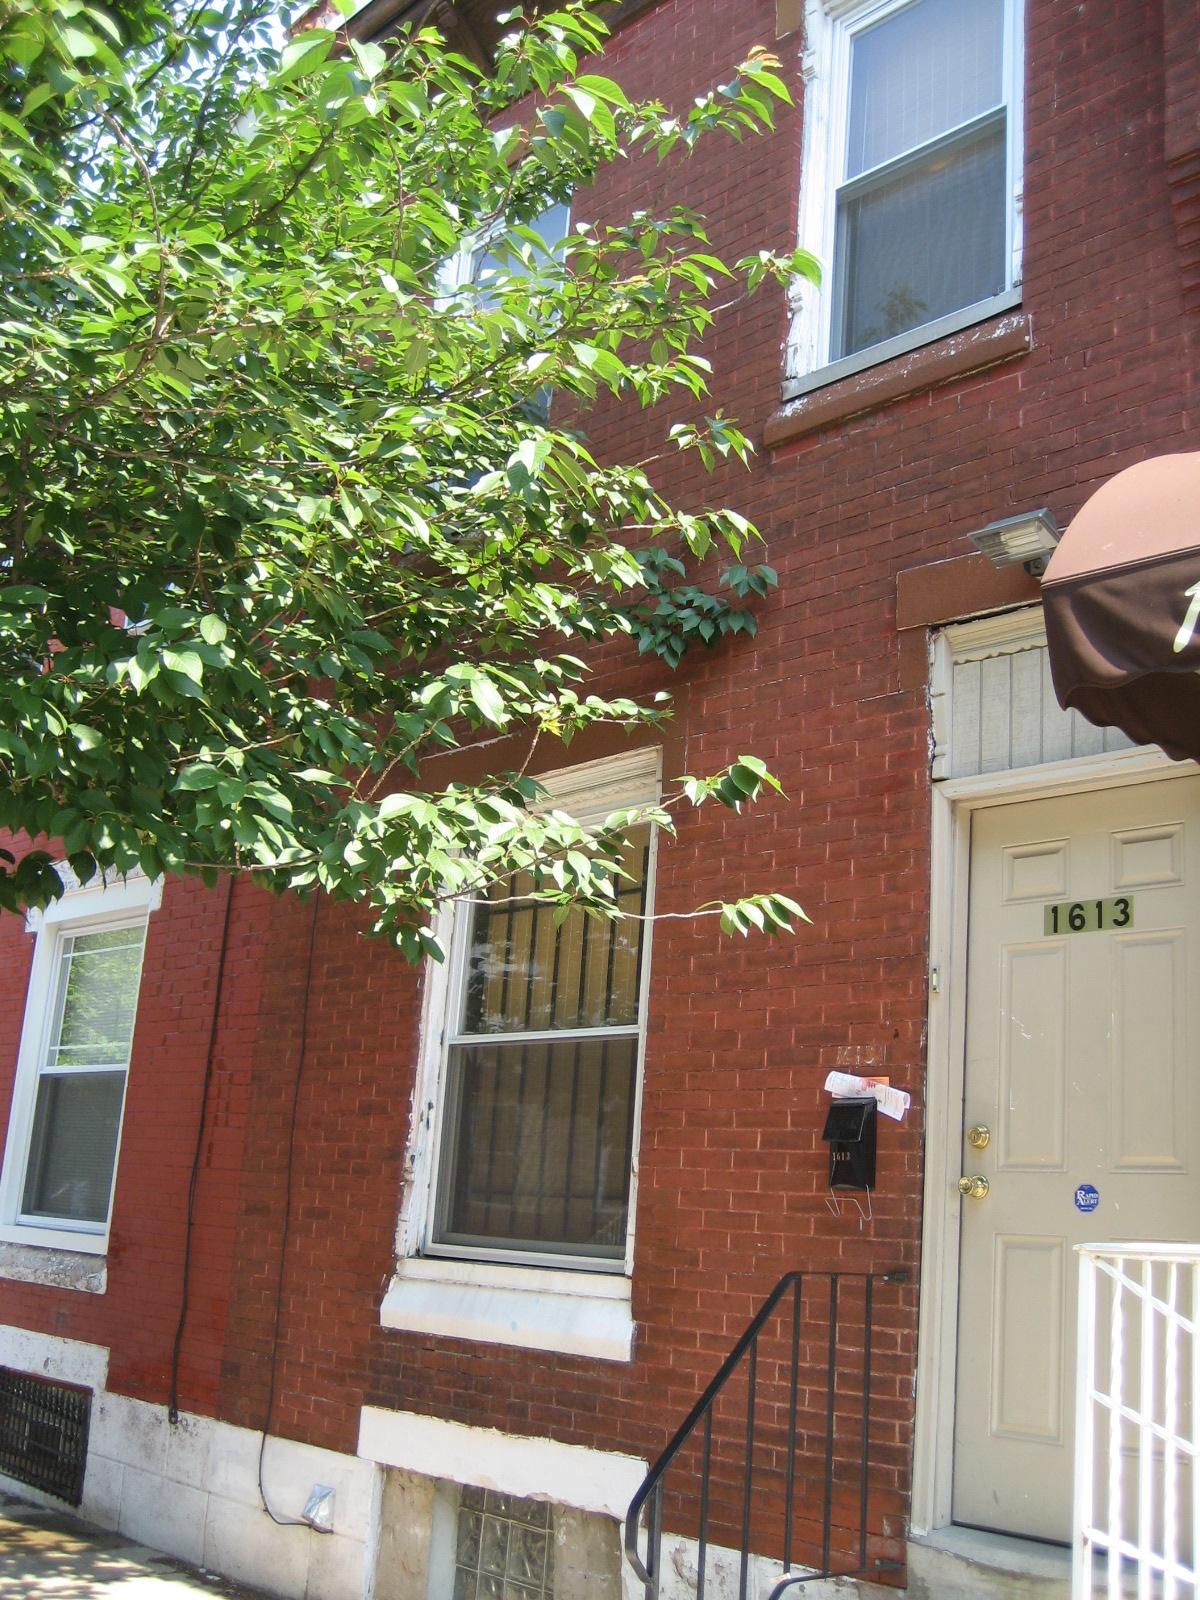 1613 Edgley Street